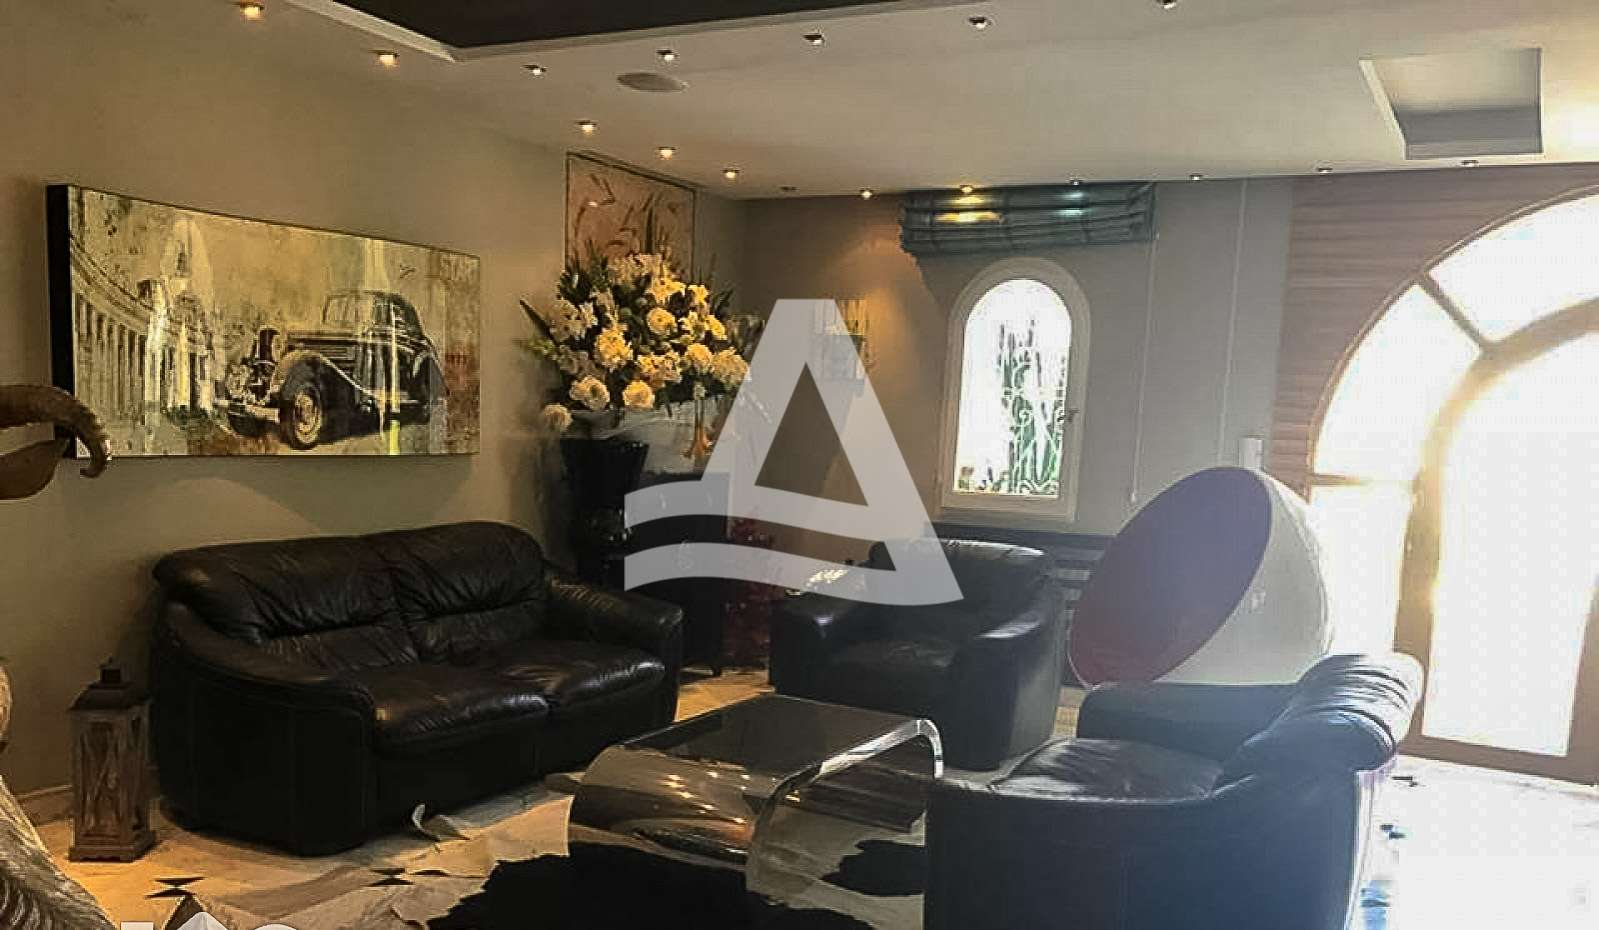 httpss3.amazonaws.comlogimoaws14834864521615193734Arcaneimmobiliere_com_-_immobilier_La_Marsa-8_1554546689645-2